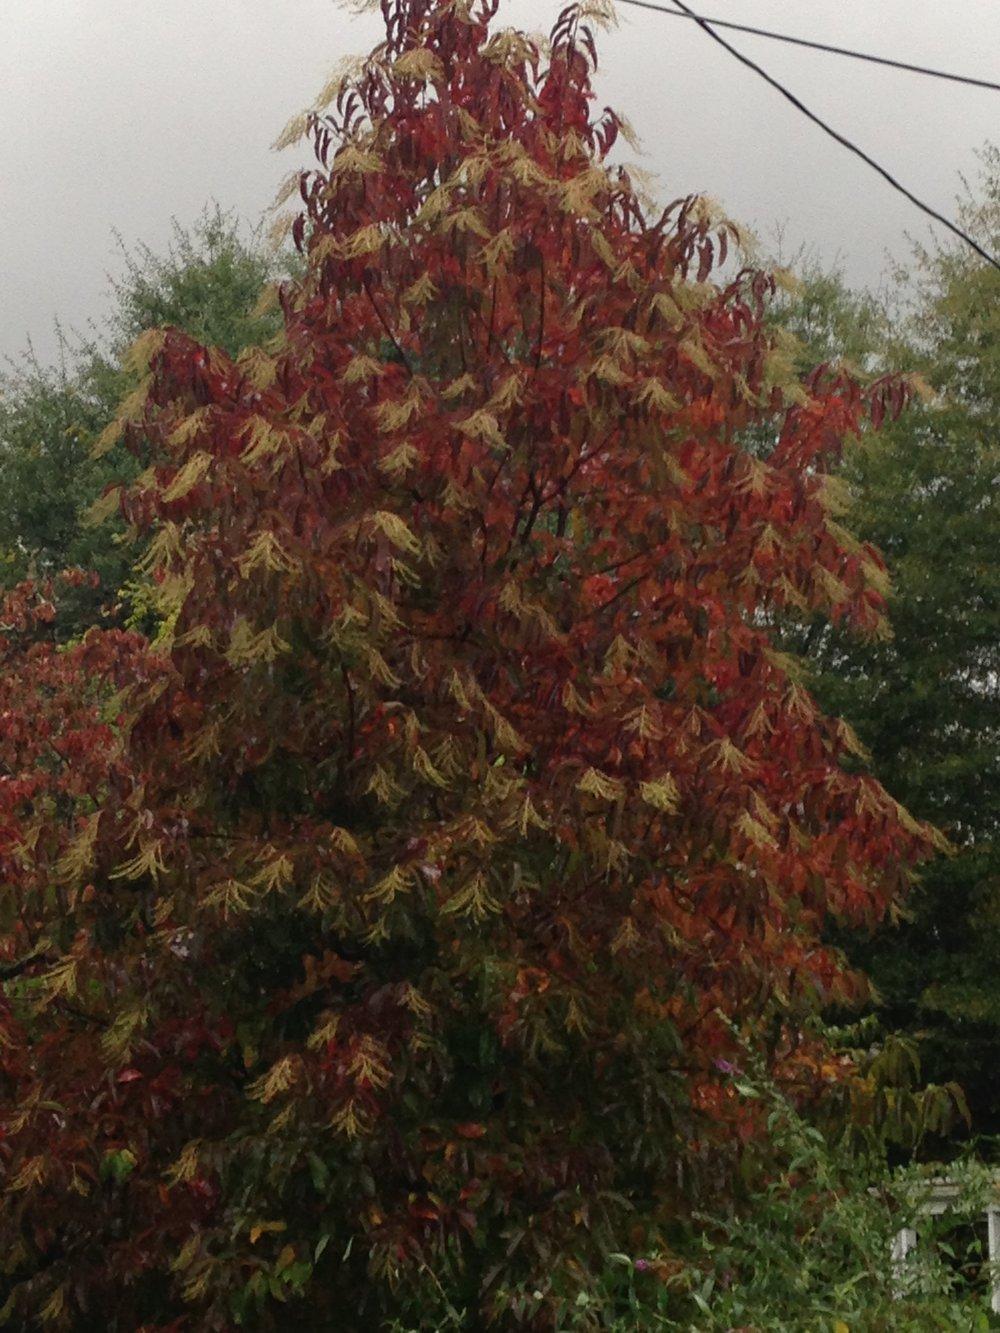 Oxeydendrum arboreum; Sourwood tree